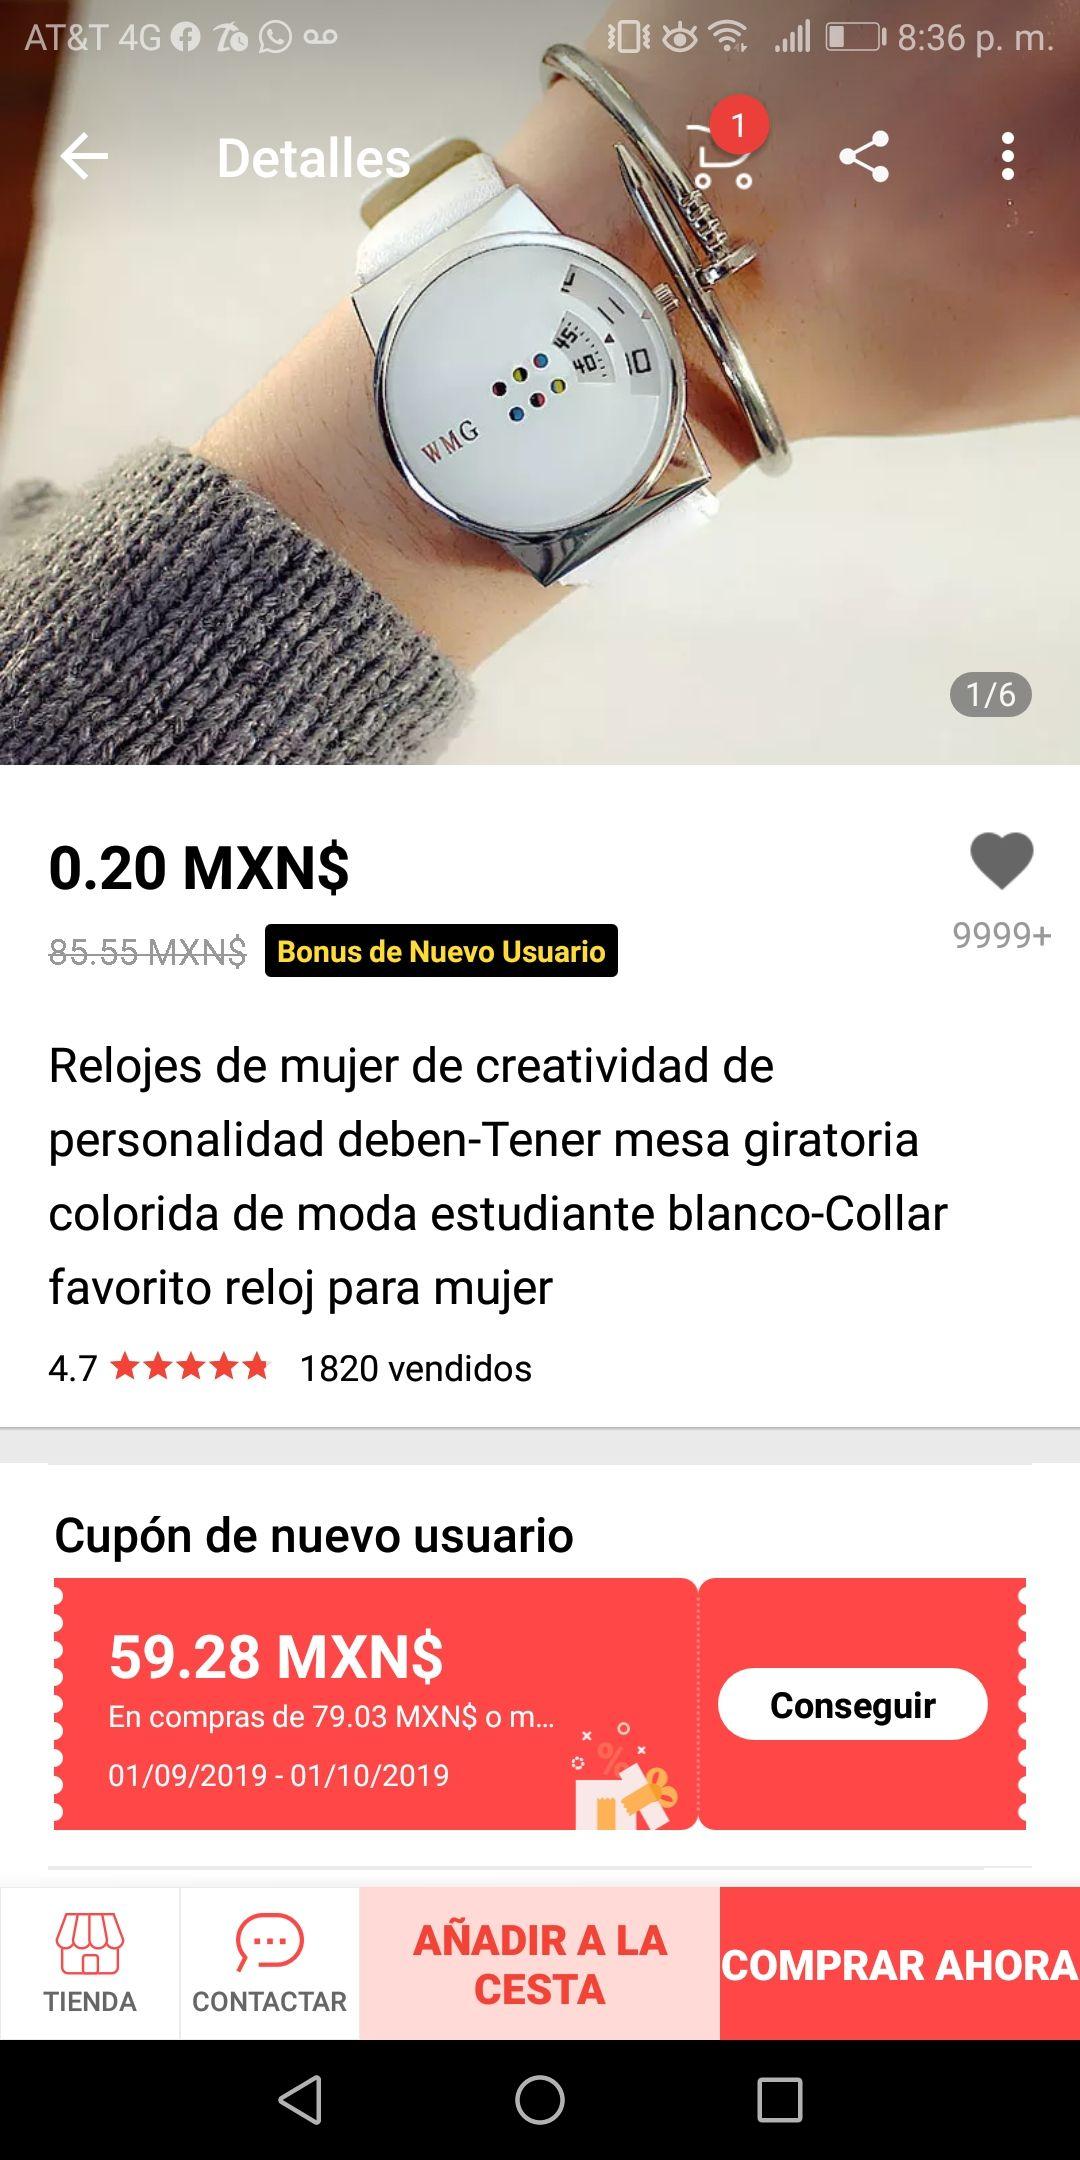 Aliexpress: Reloj de mujer casi gratis